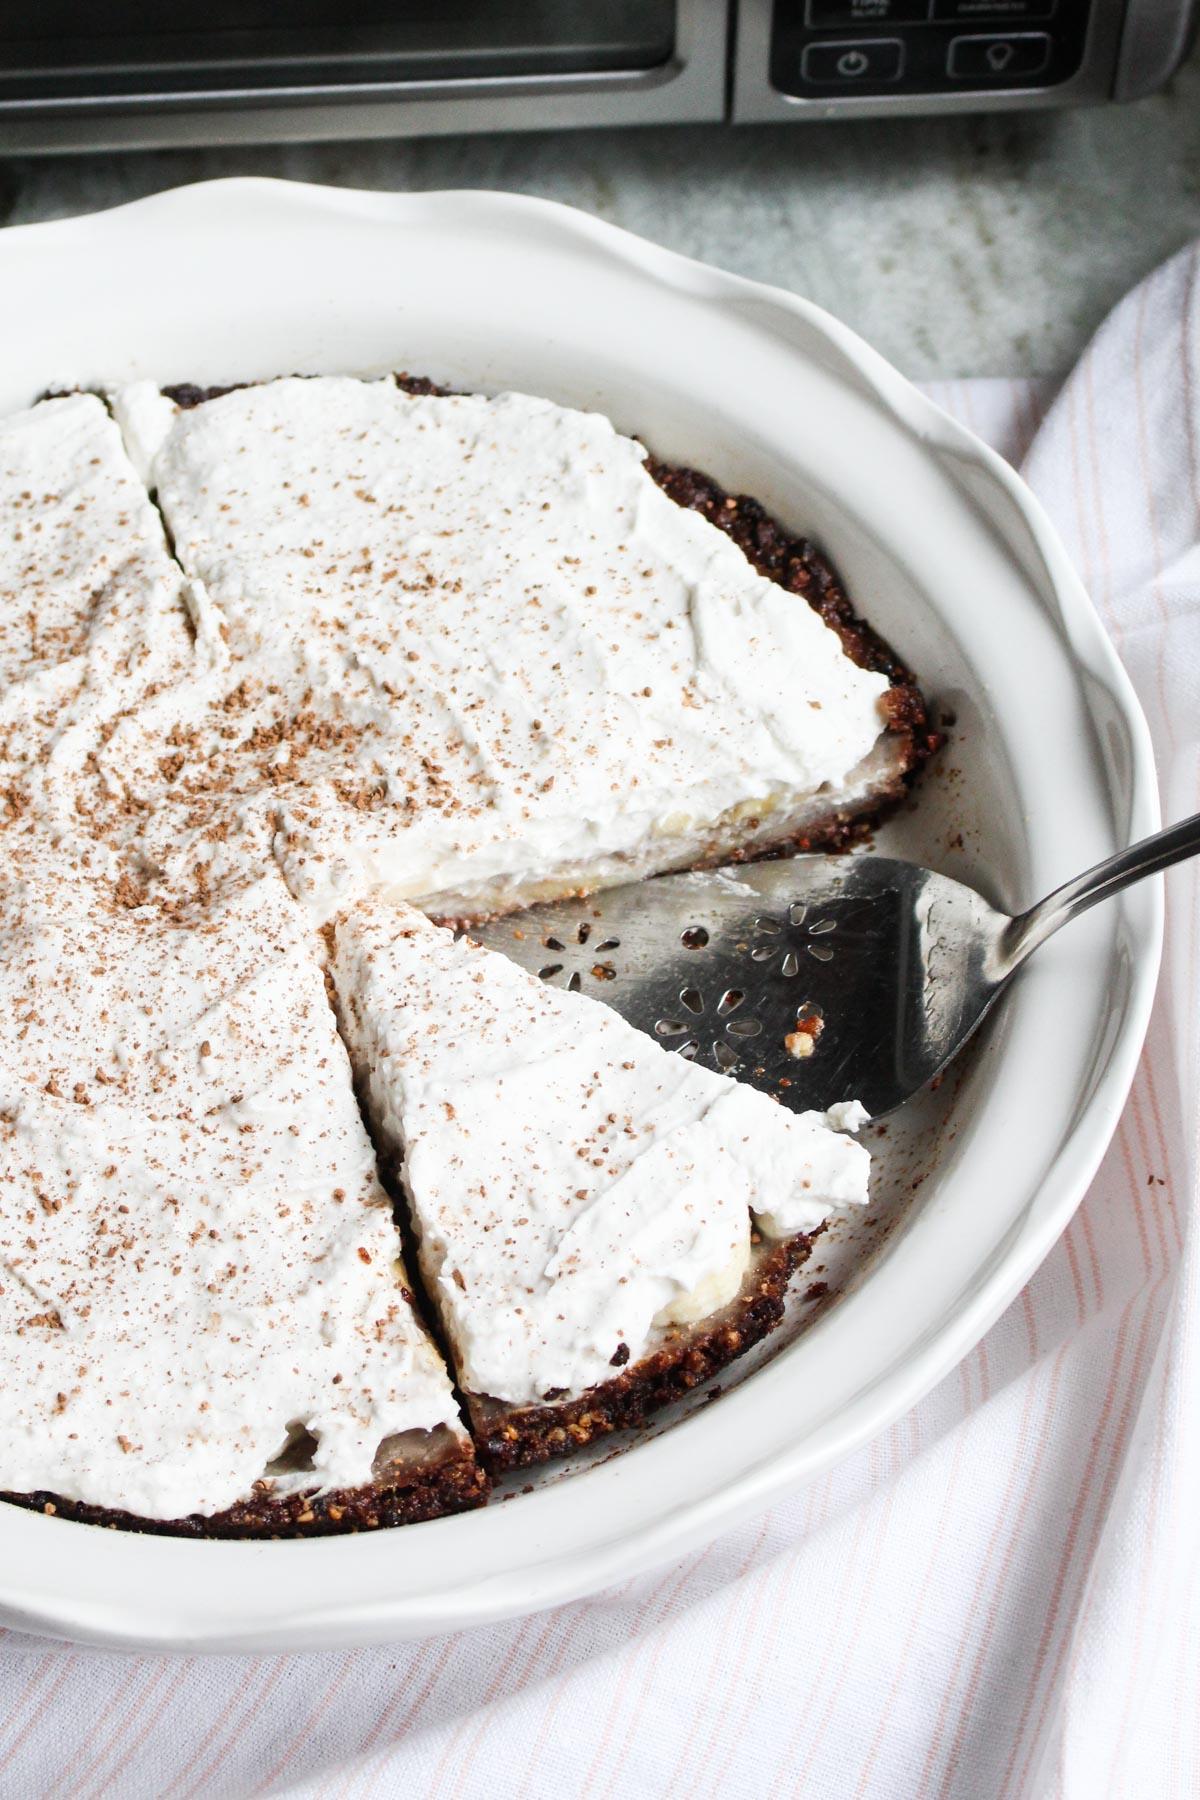 Banana cream pie with cinnamon sprinkled on top.